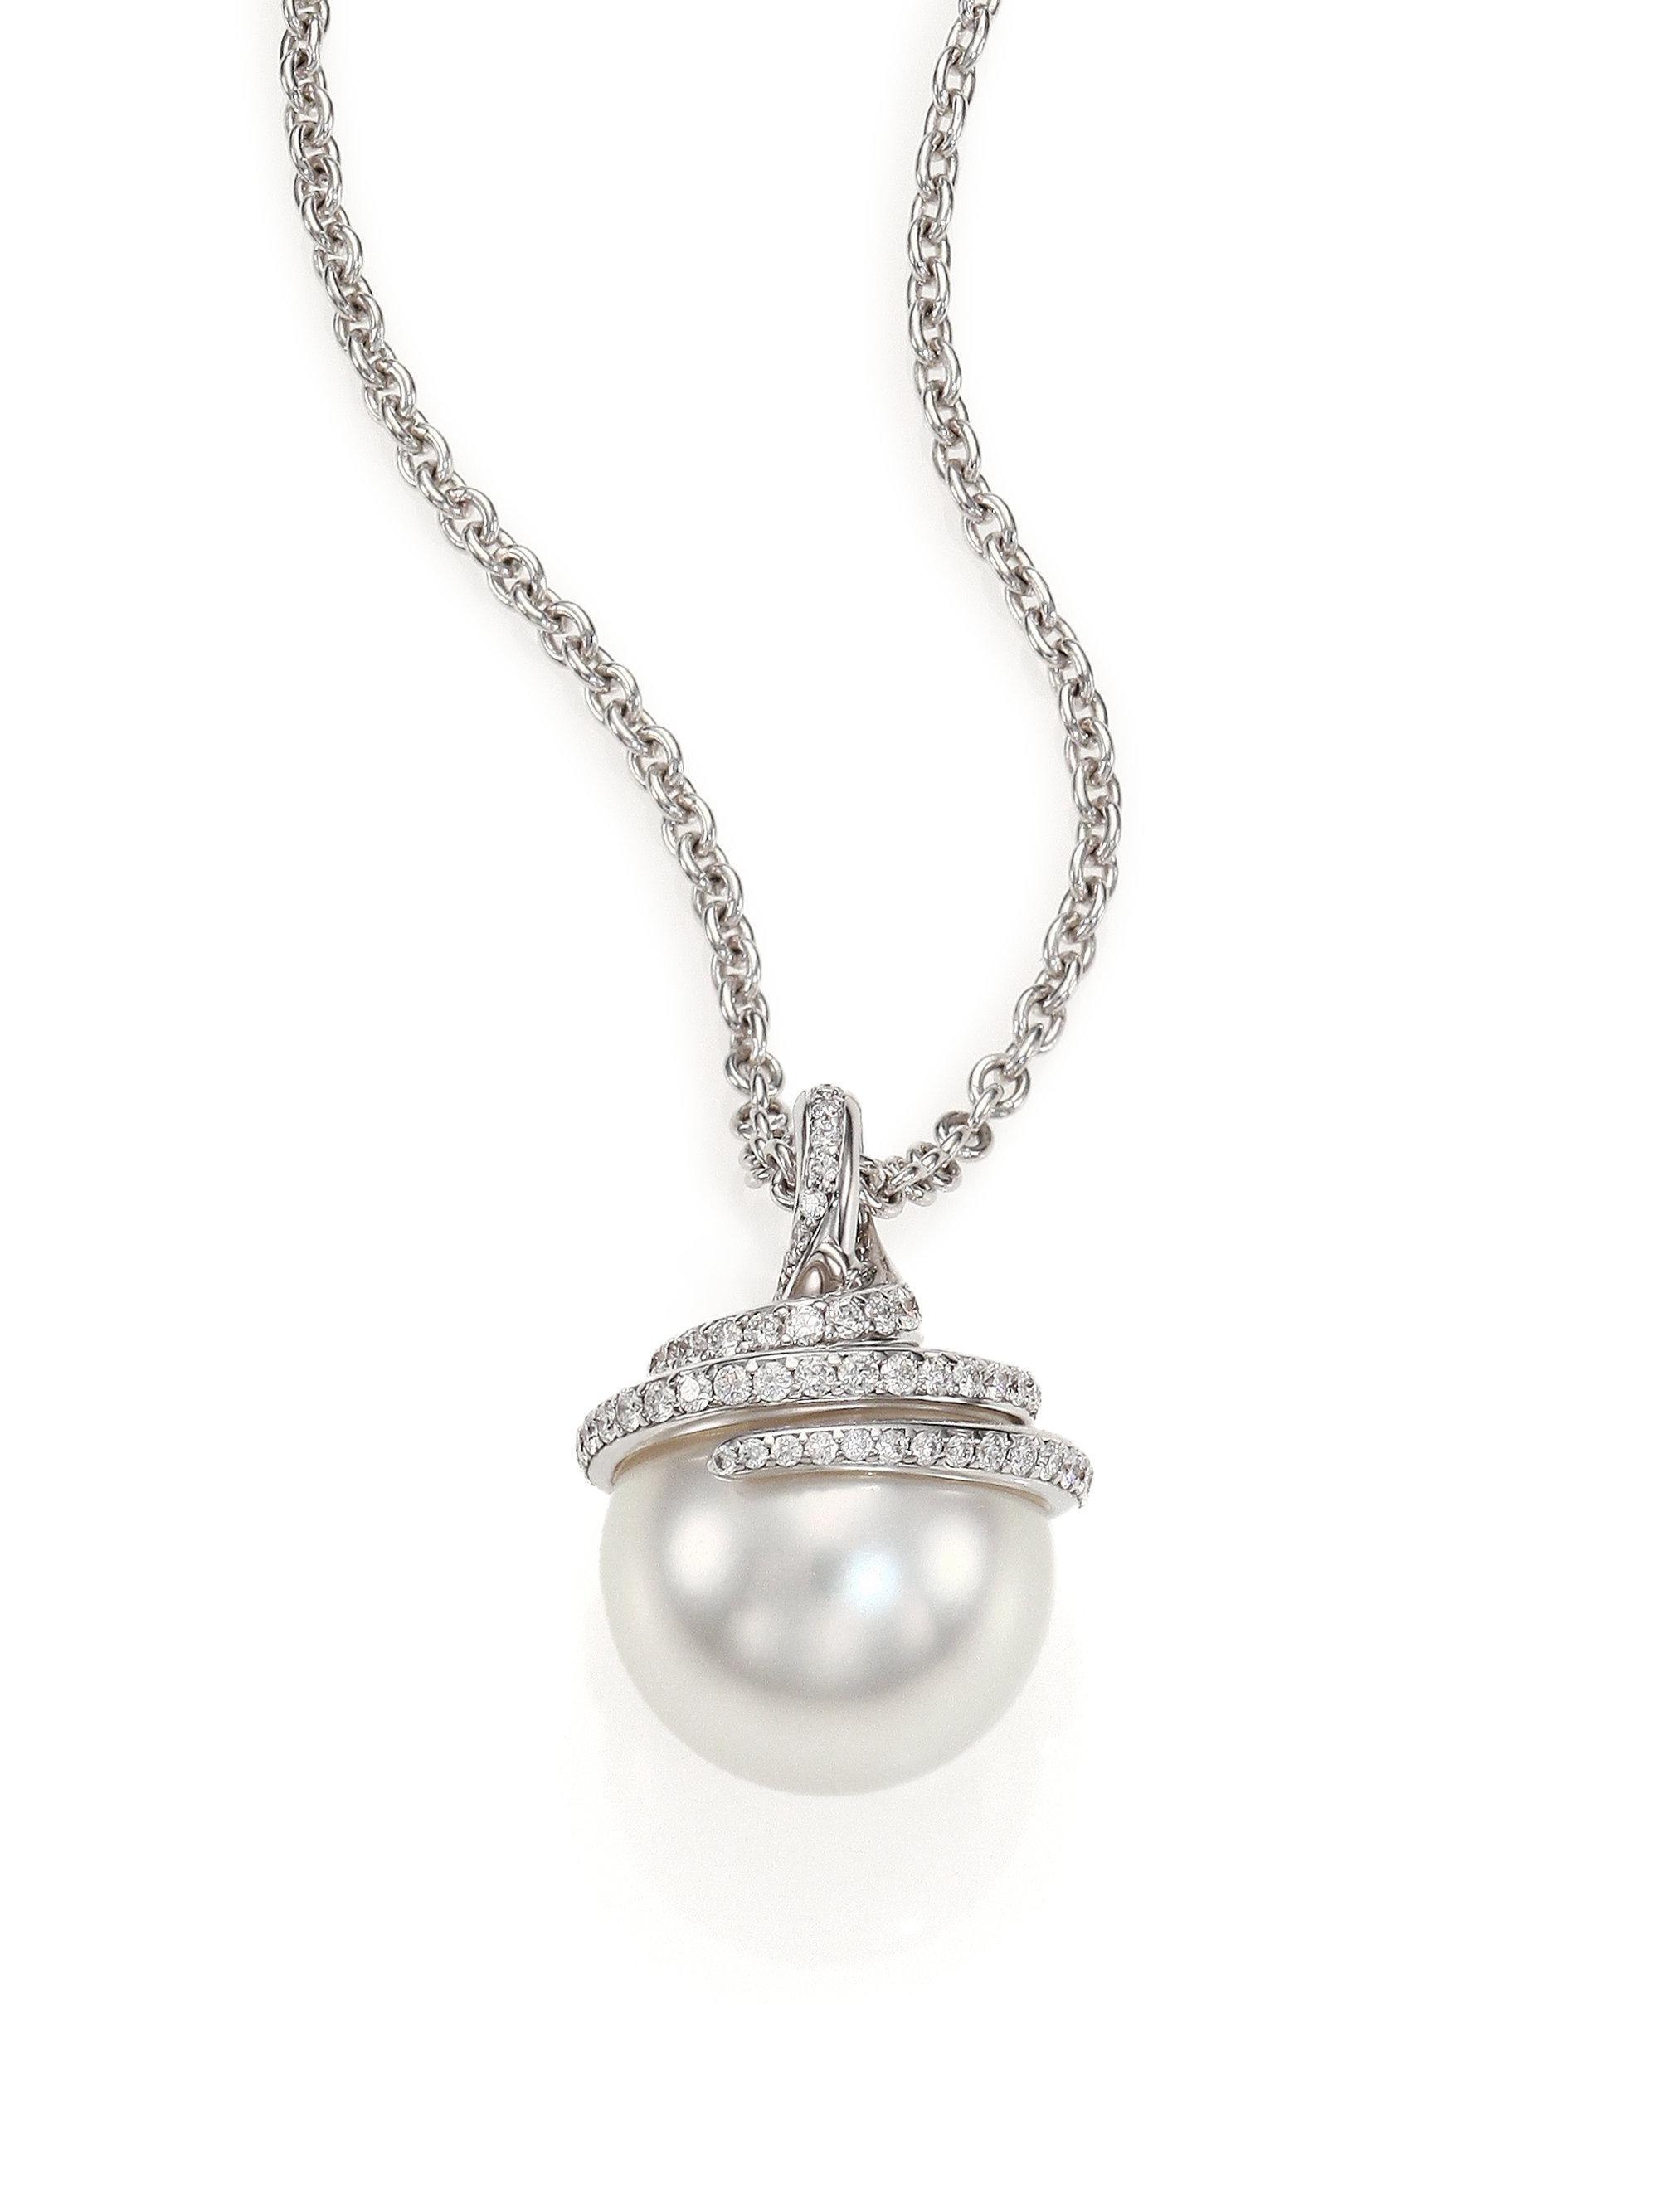 ee208b7b17f04 Mikimoto Metallic Twist 11mm White Cultured South Sea Pearl, Diamond & 18k  White Gold Pendant Necklace